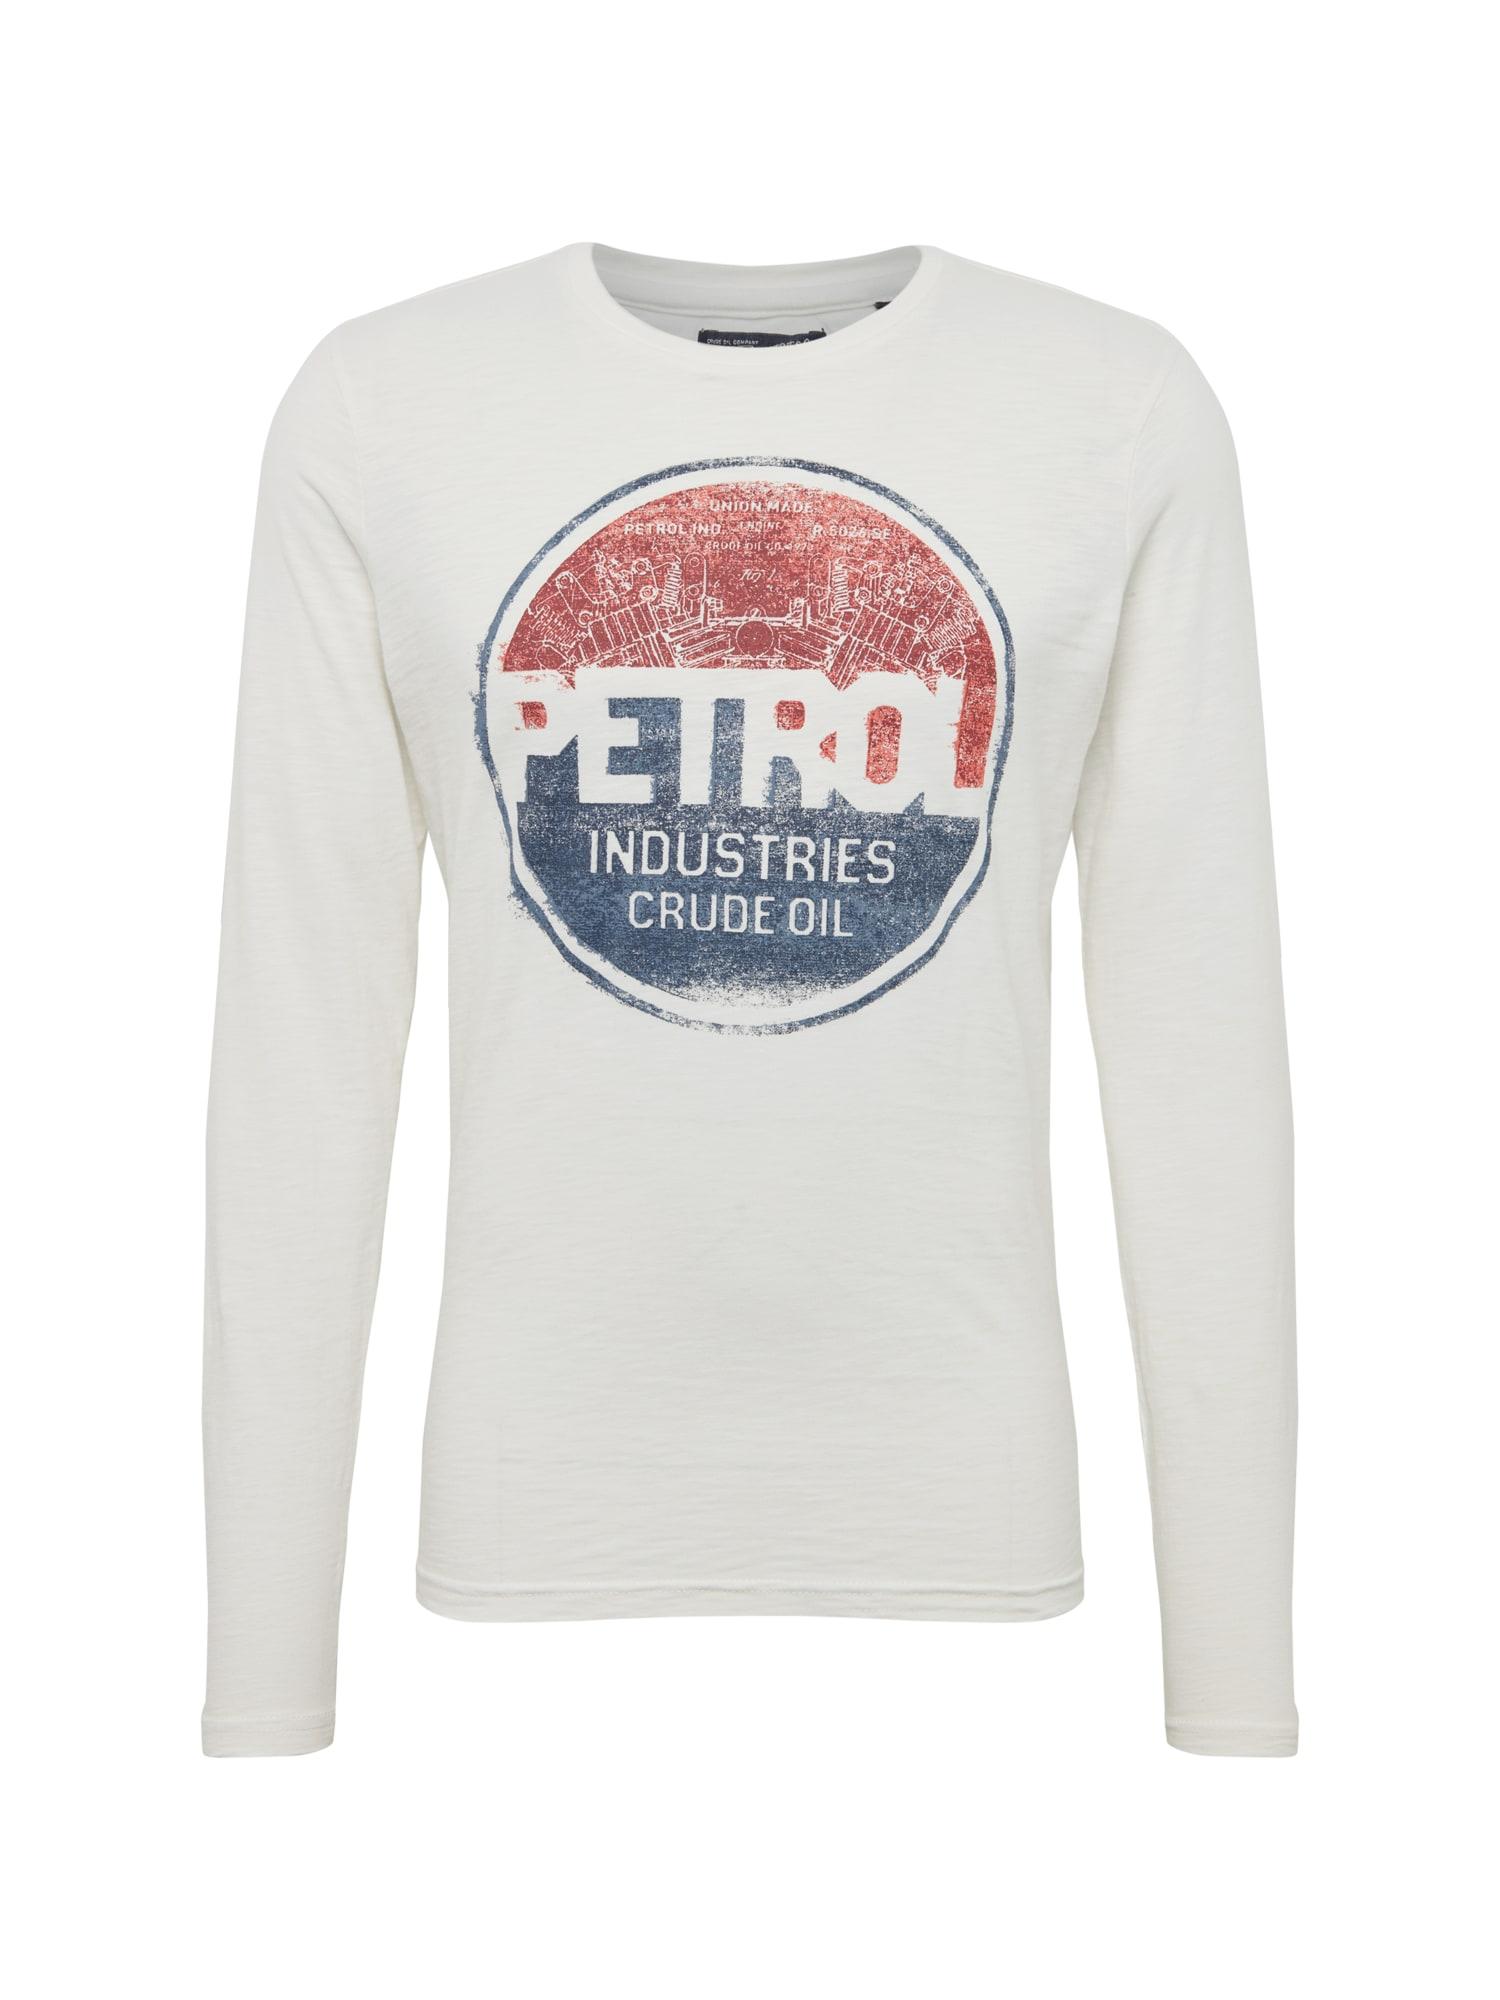 Tričko modrá červená bílá Petrol Industries